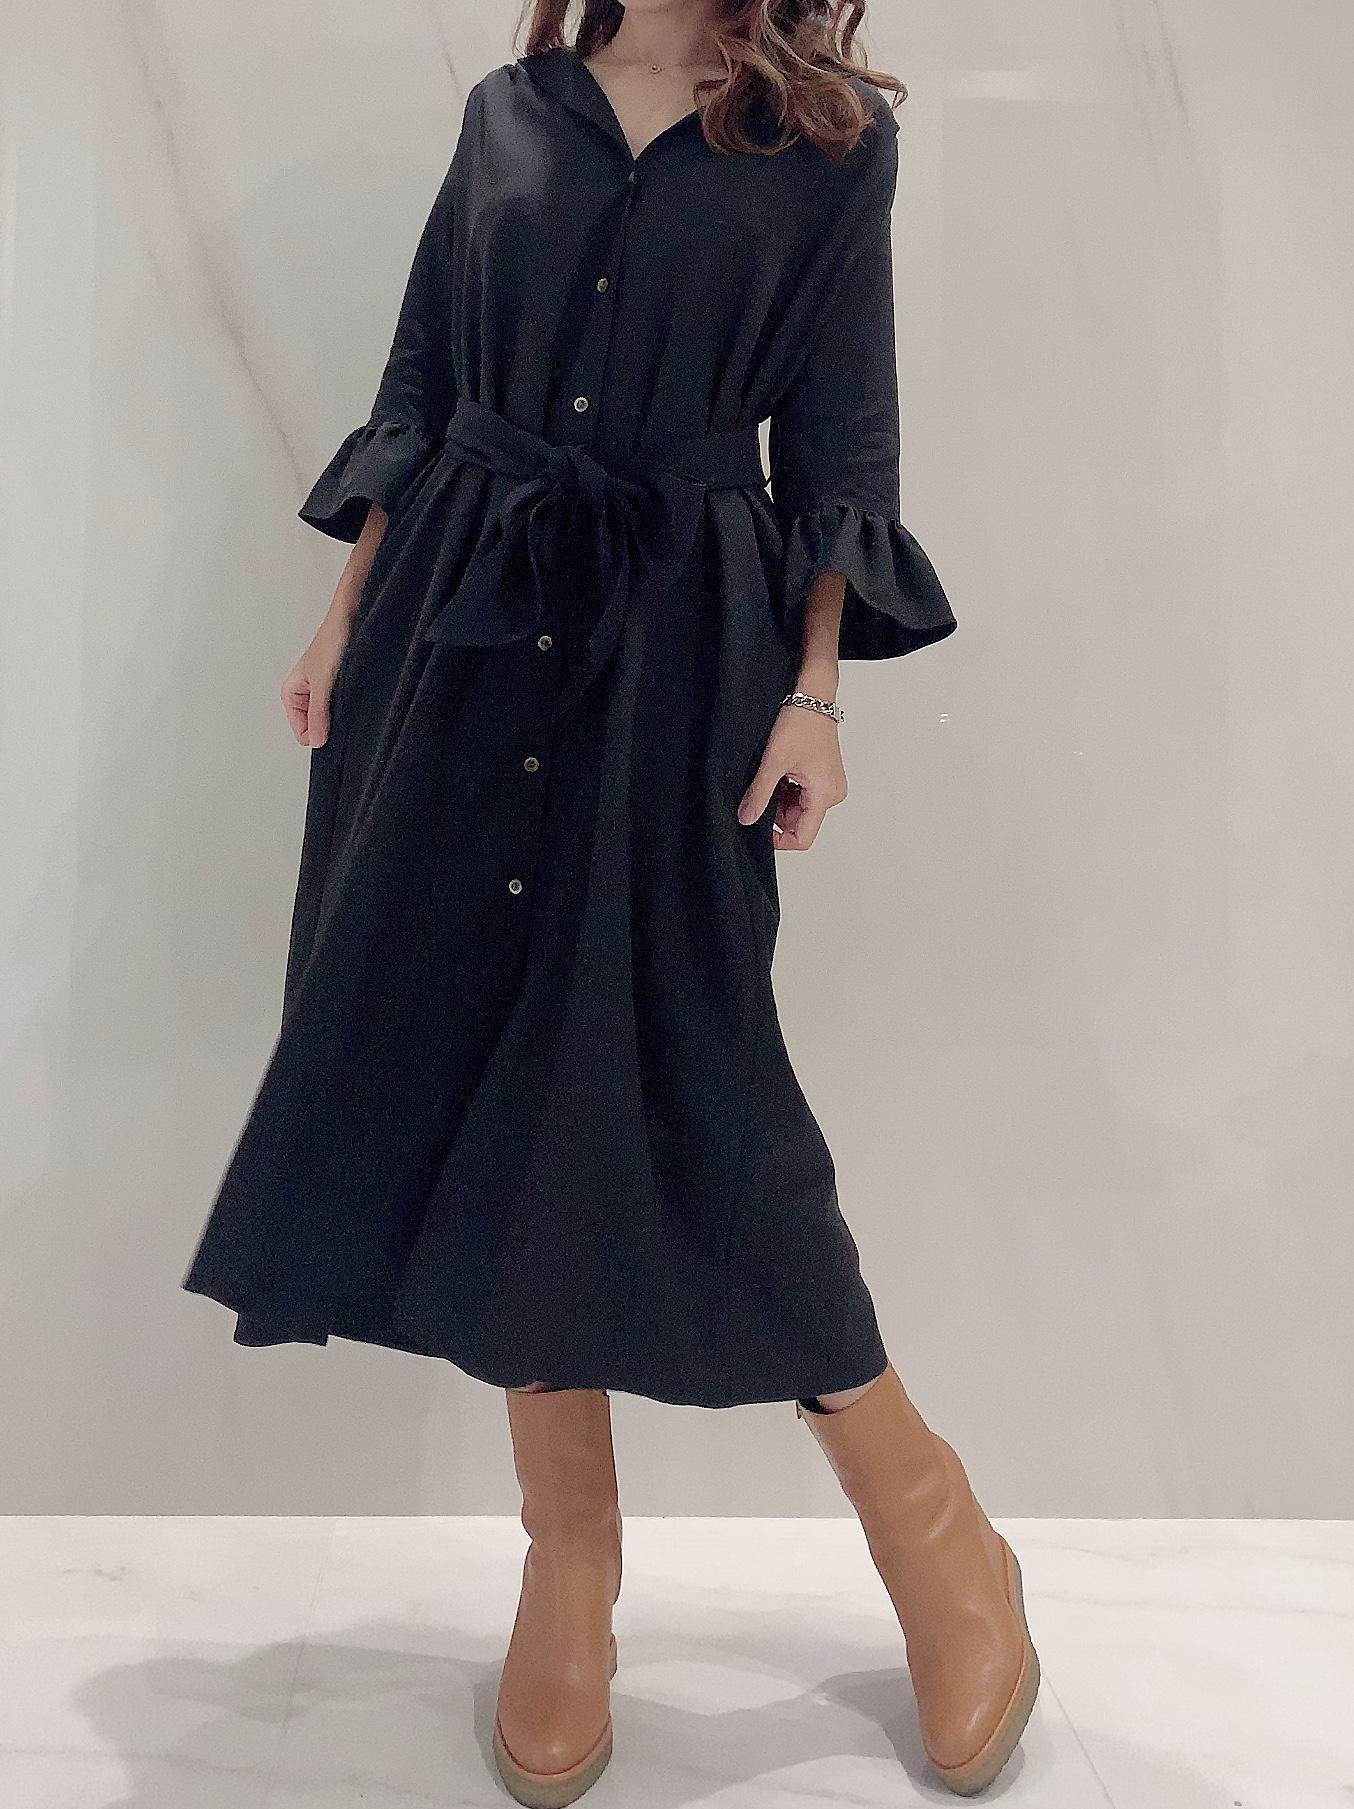 【selva secreta】SHIRTS DRESS(black)